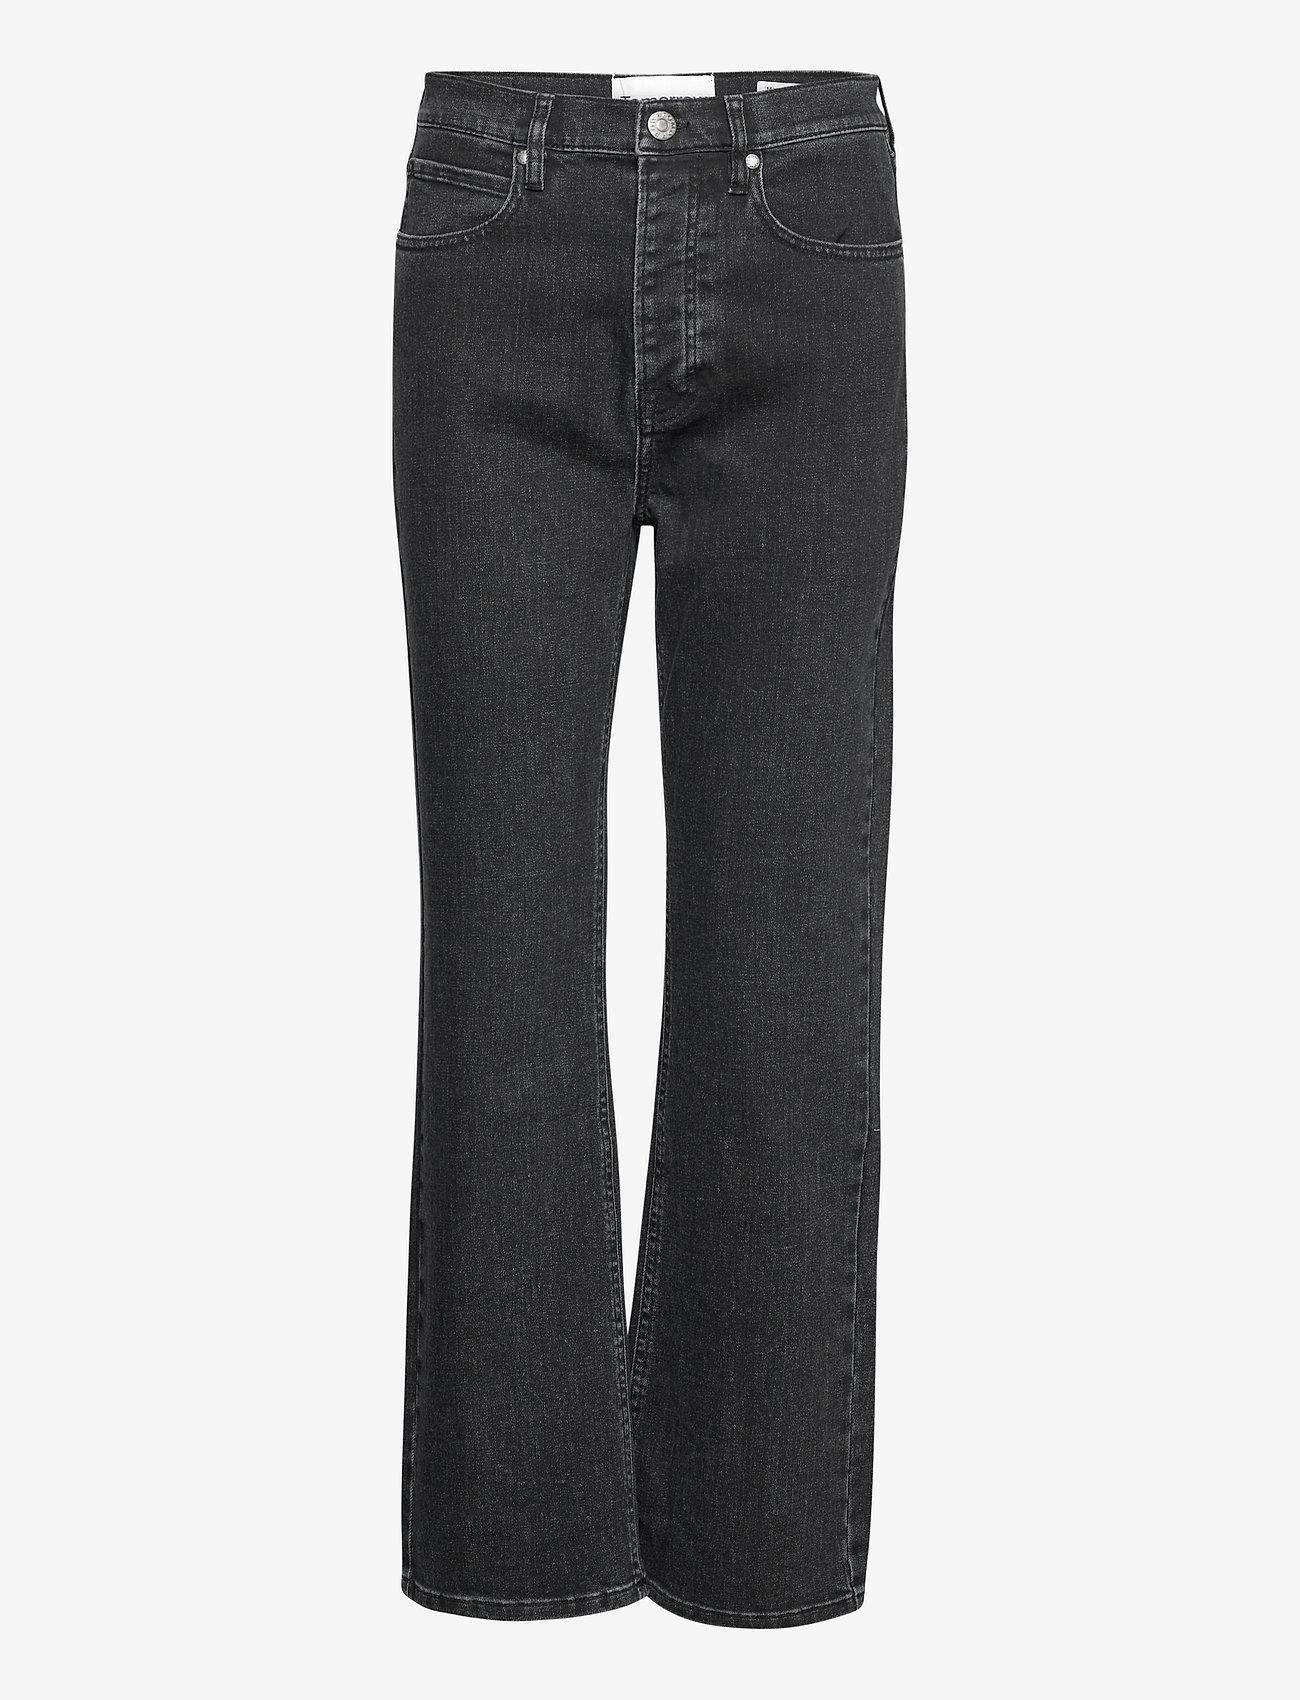 Tomorrow - Marston jeans original black - straight jeans - black - 0